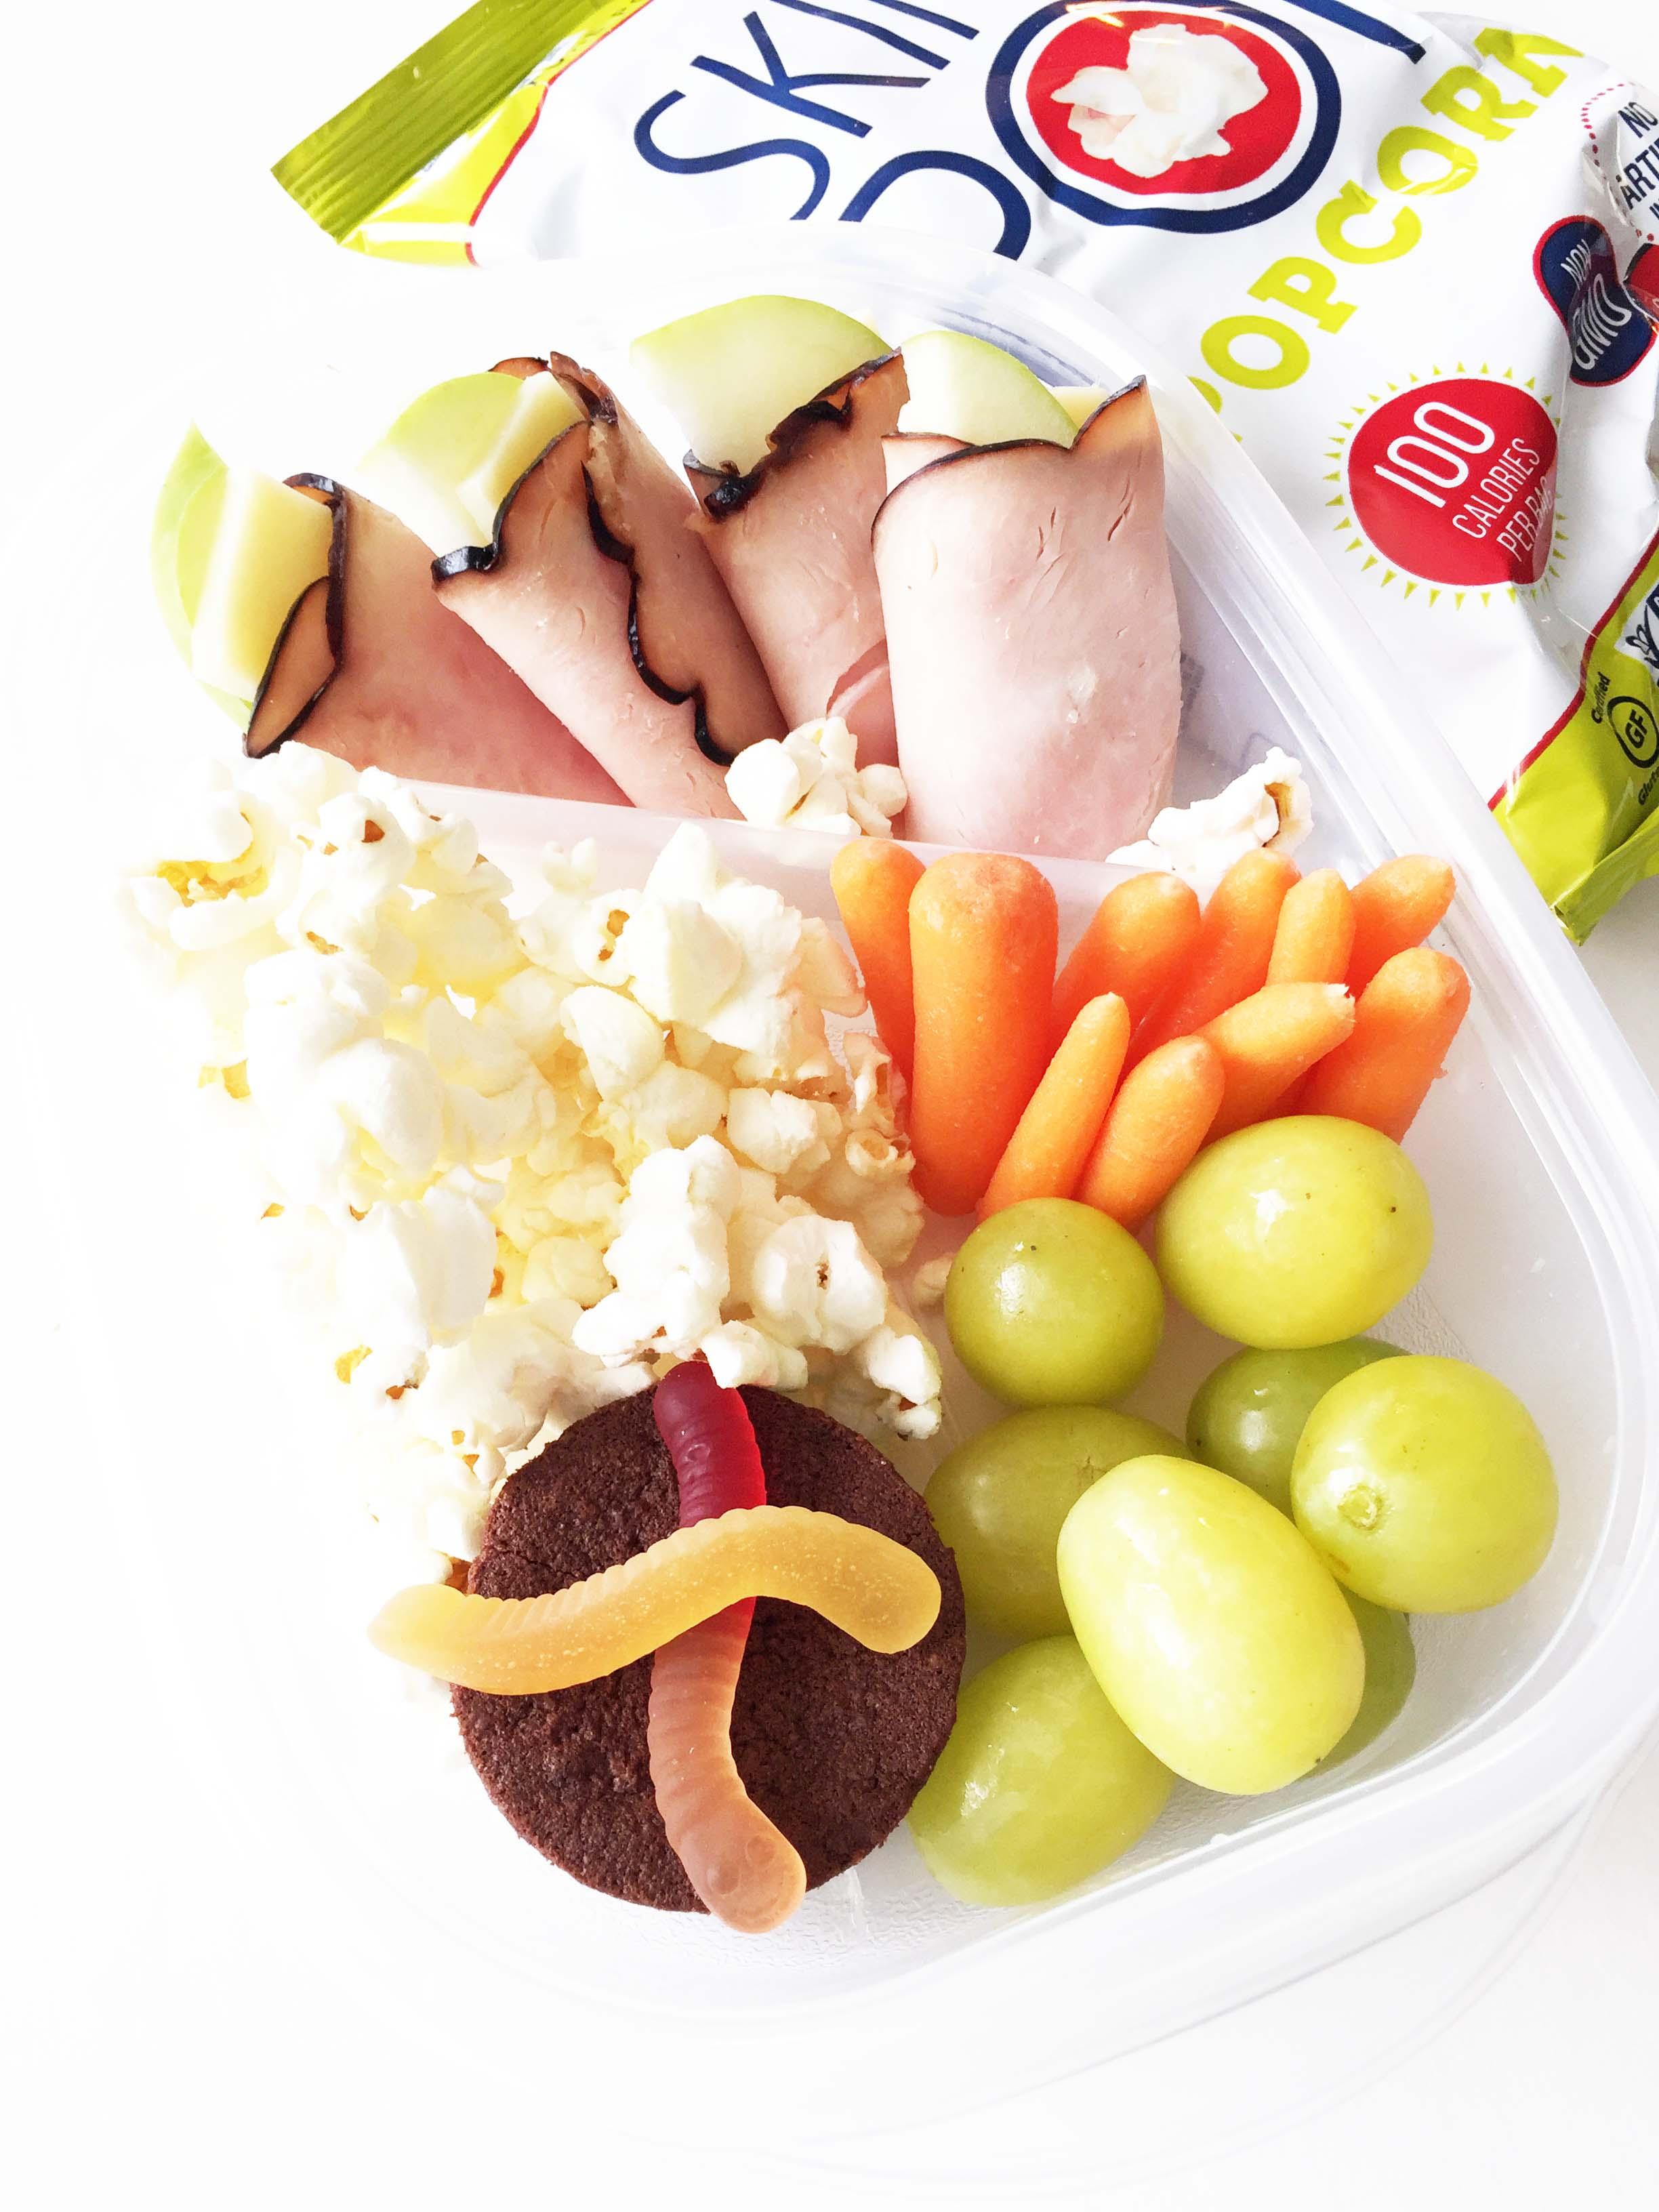 popcorn-lunchbox3.jpg